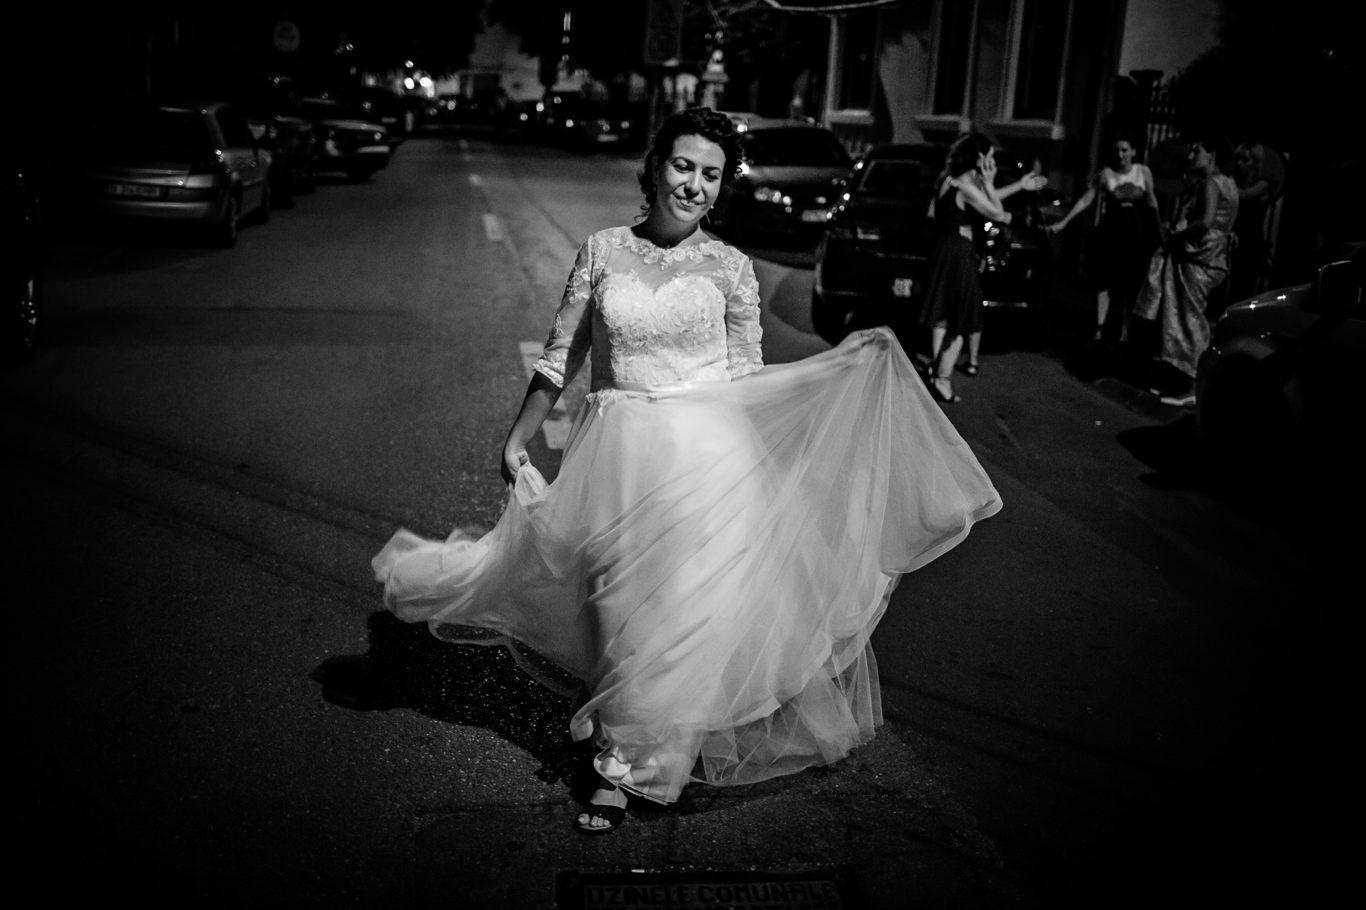 0731-fotografie-nunta-bucuresti-anca-george-fotograf-ciprian-dumitrescu-dcf_6214